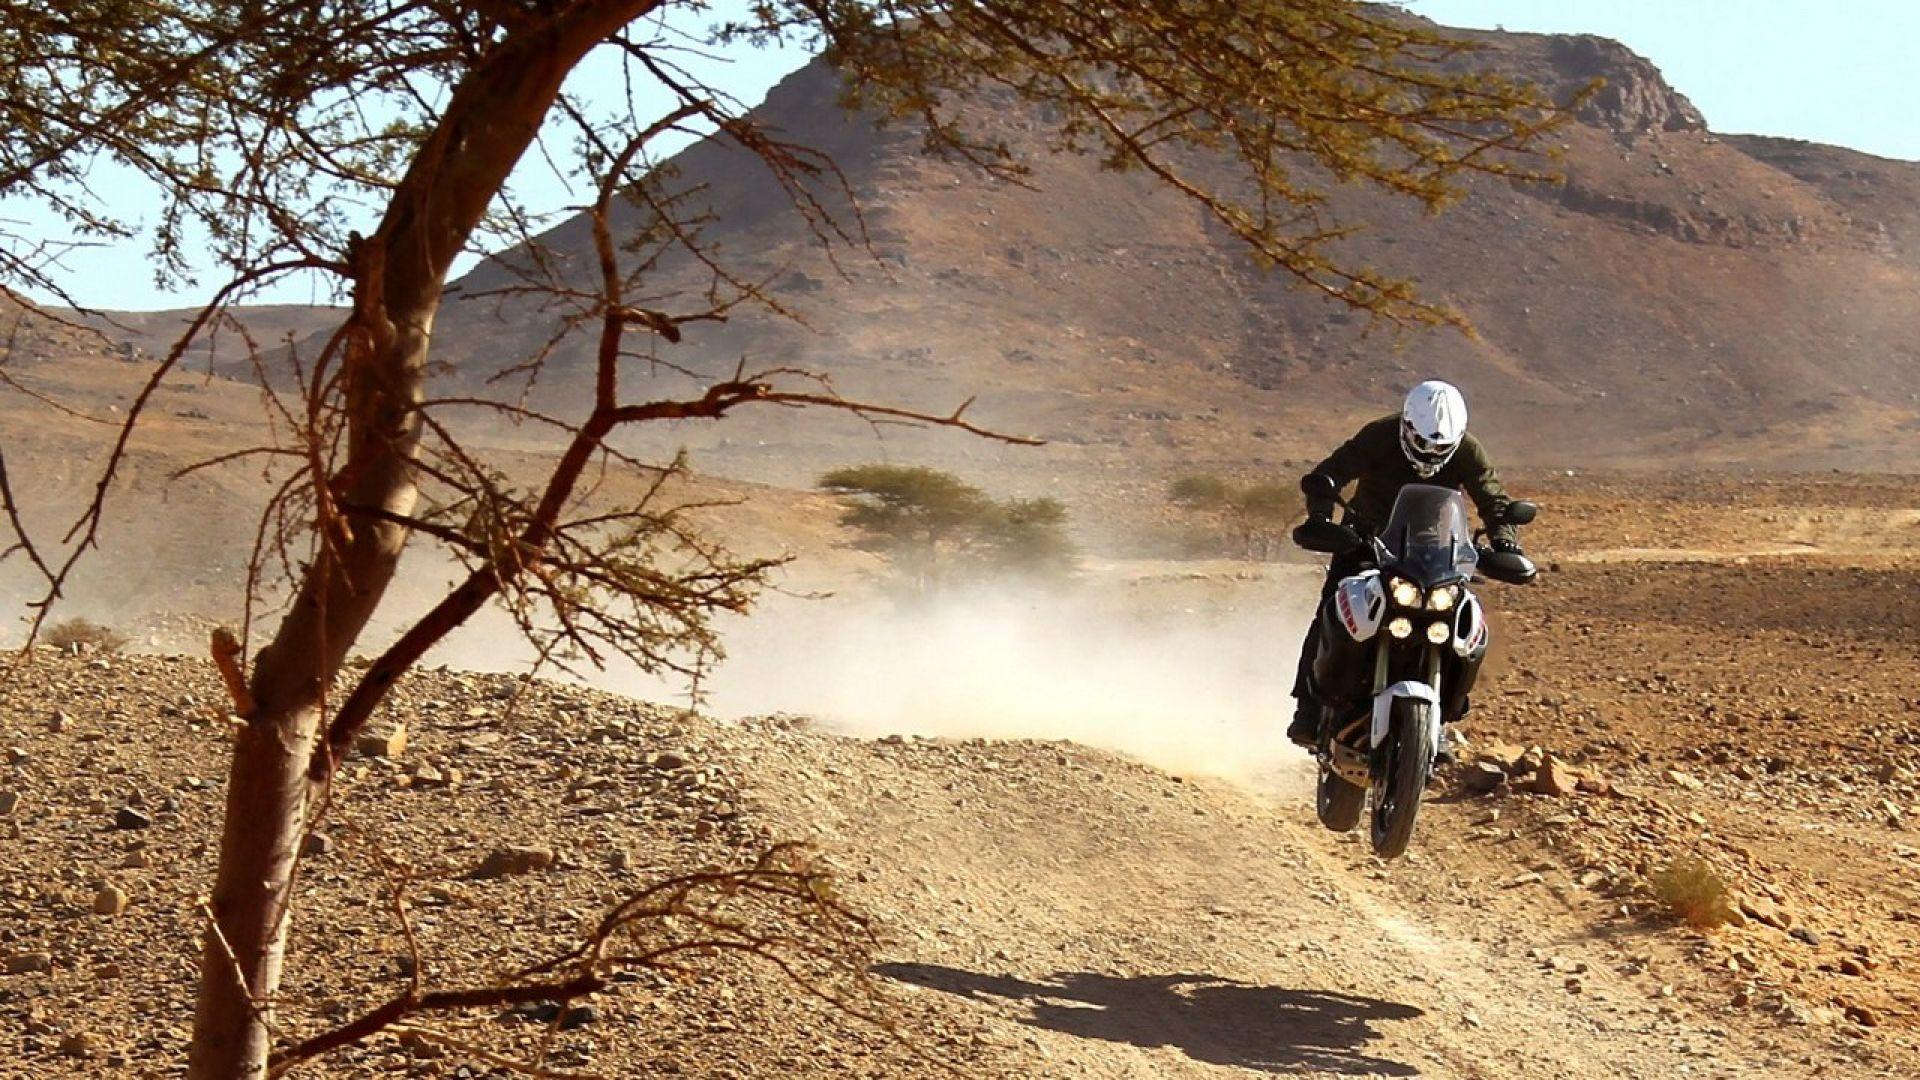 Immagine 106: In Marocco con la Yamaha Super Ténéré